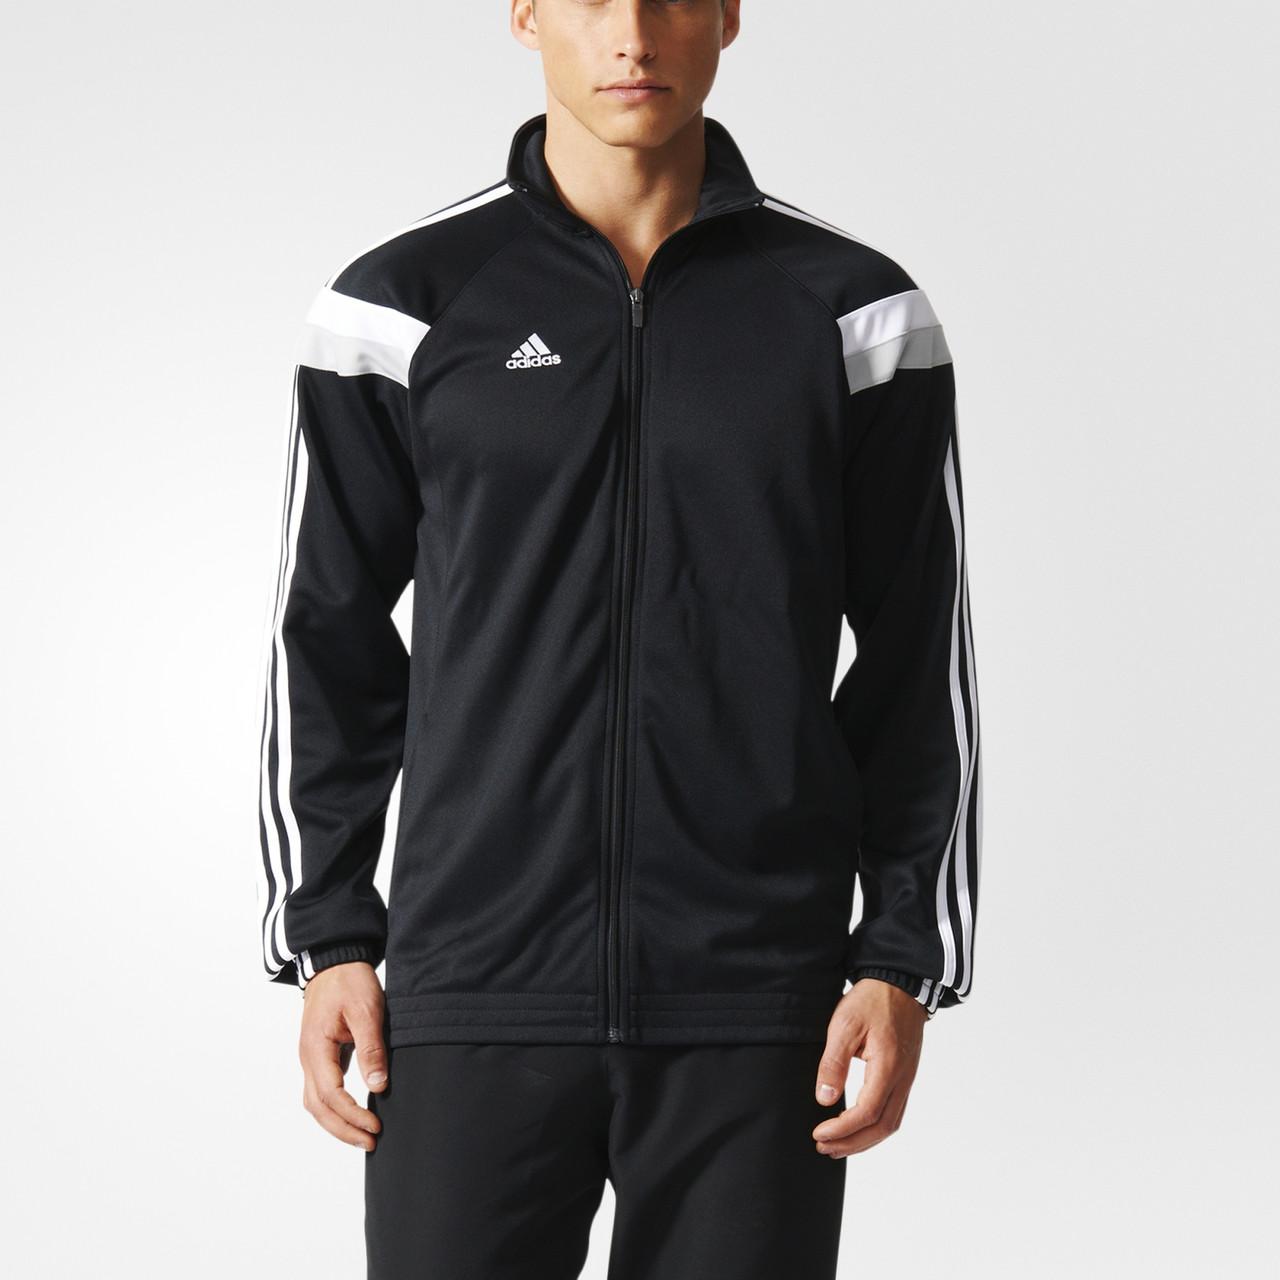 Олимпийка adidas мужская Command Jacket